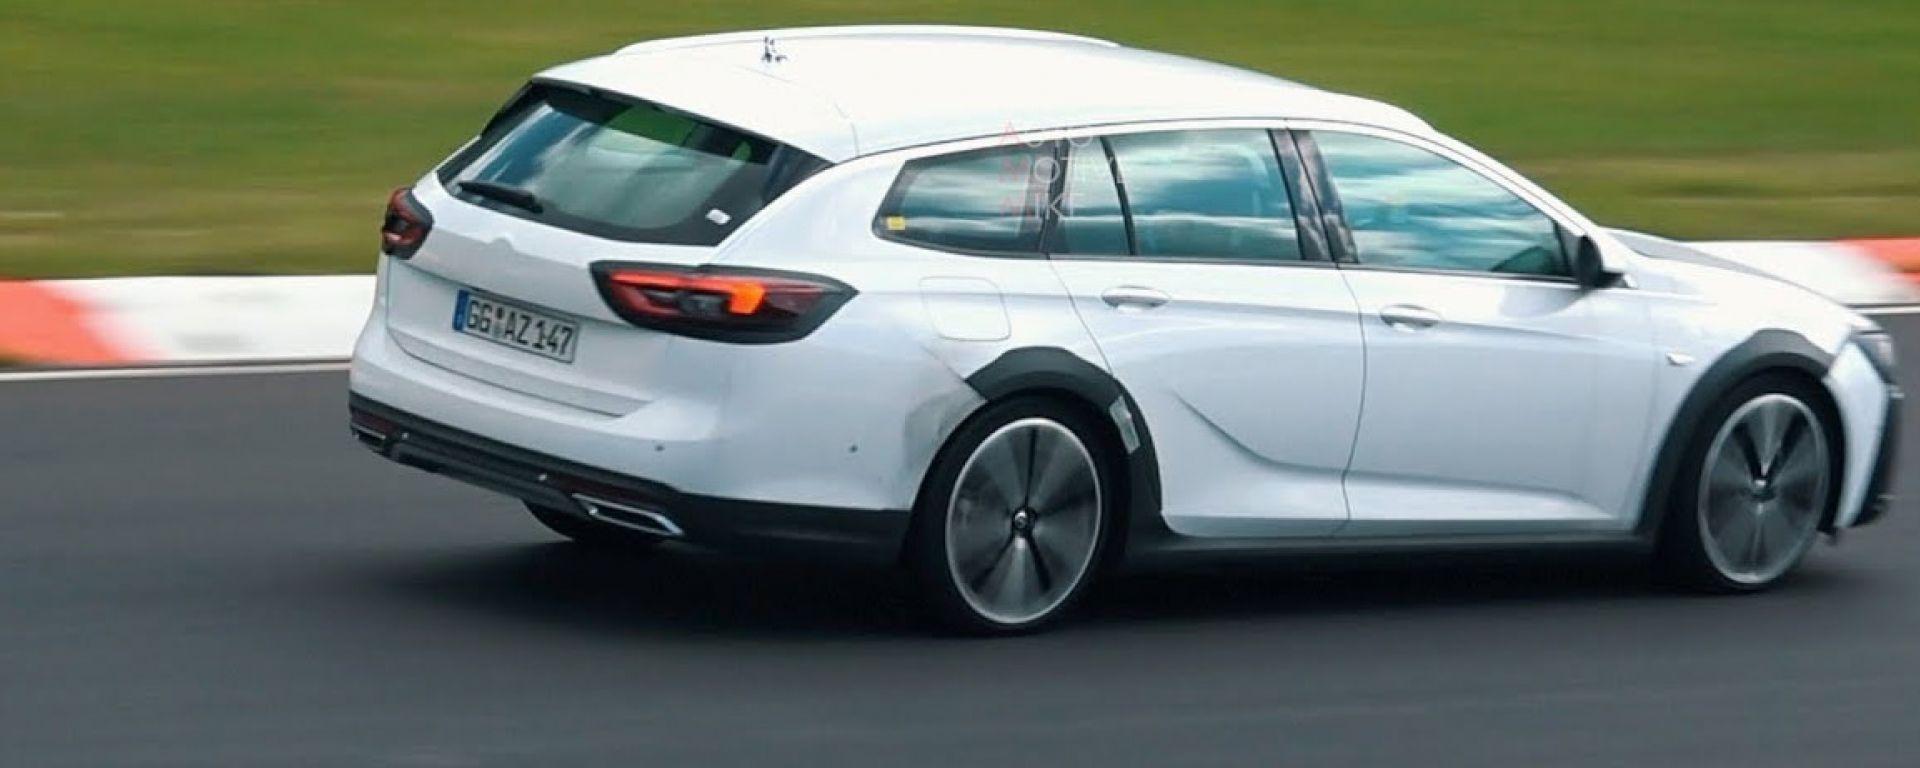 Opel Insignia Sports Tourer, foto spia del facelift 2020